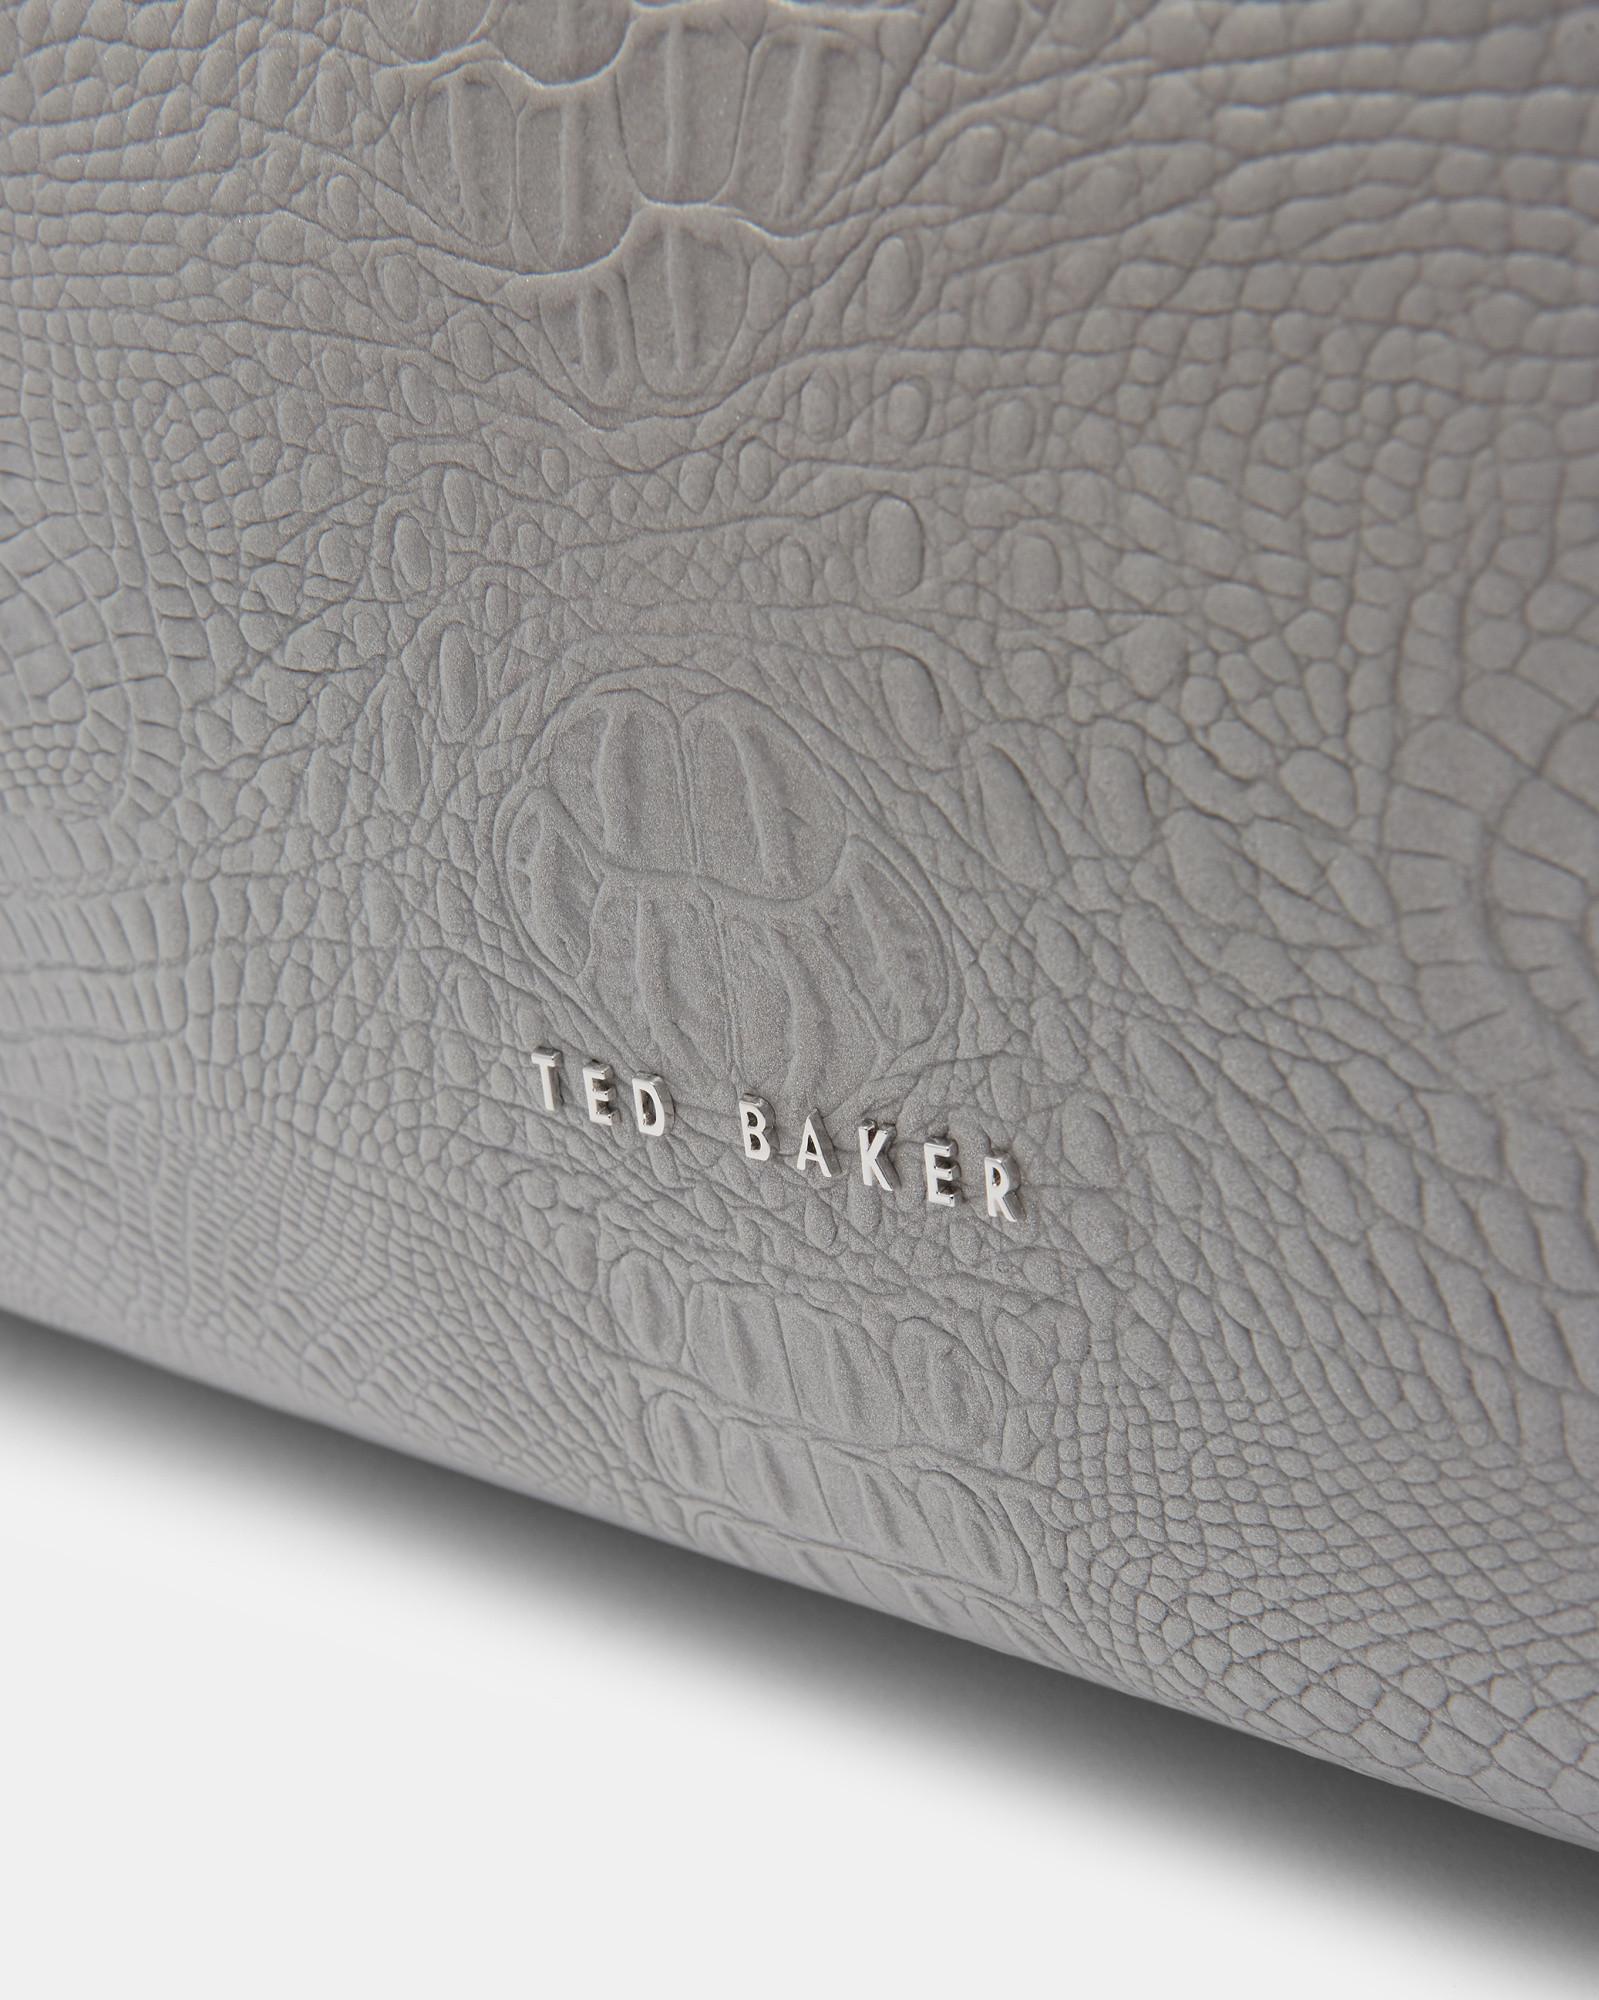 9678f5df1d22 Ted Baker Croc Embossed Duffel Bag in Metallic - Lyst